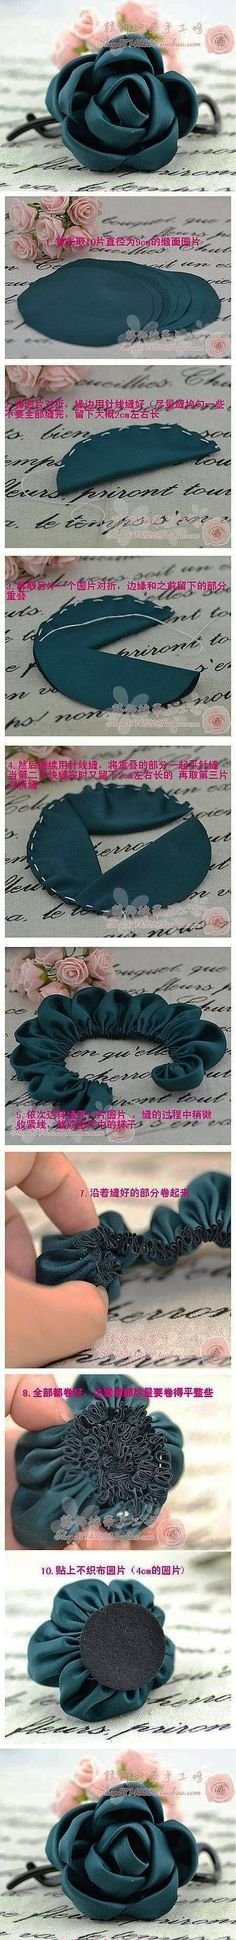 sewing flower... ♥ Deniz ♥: